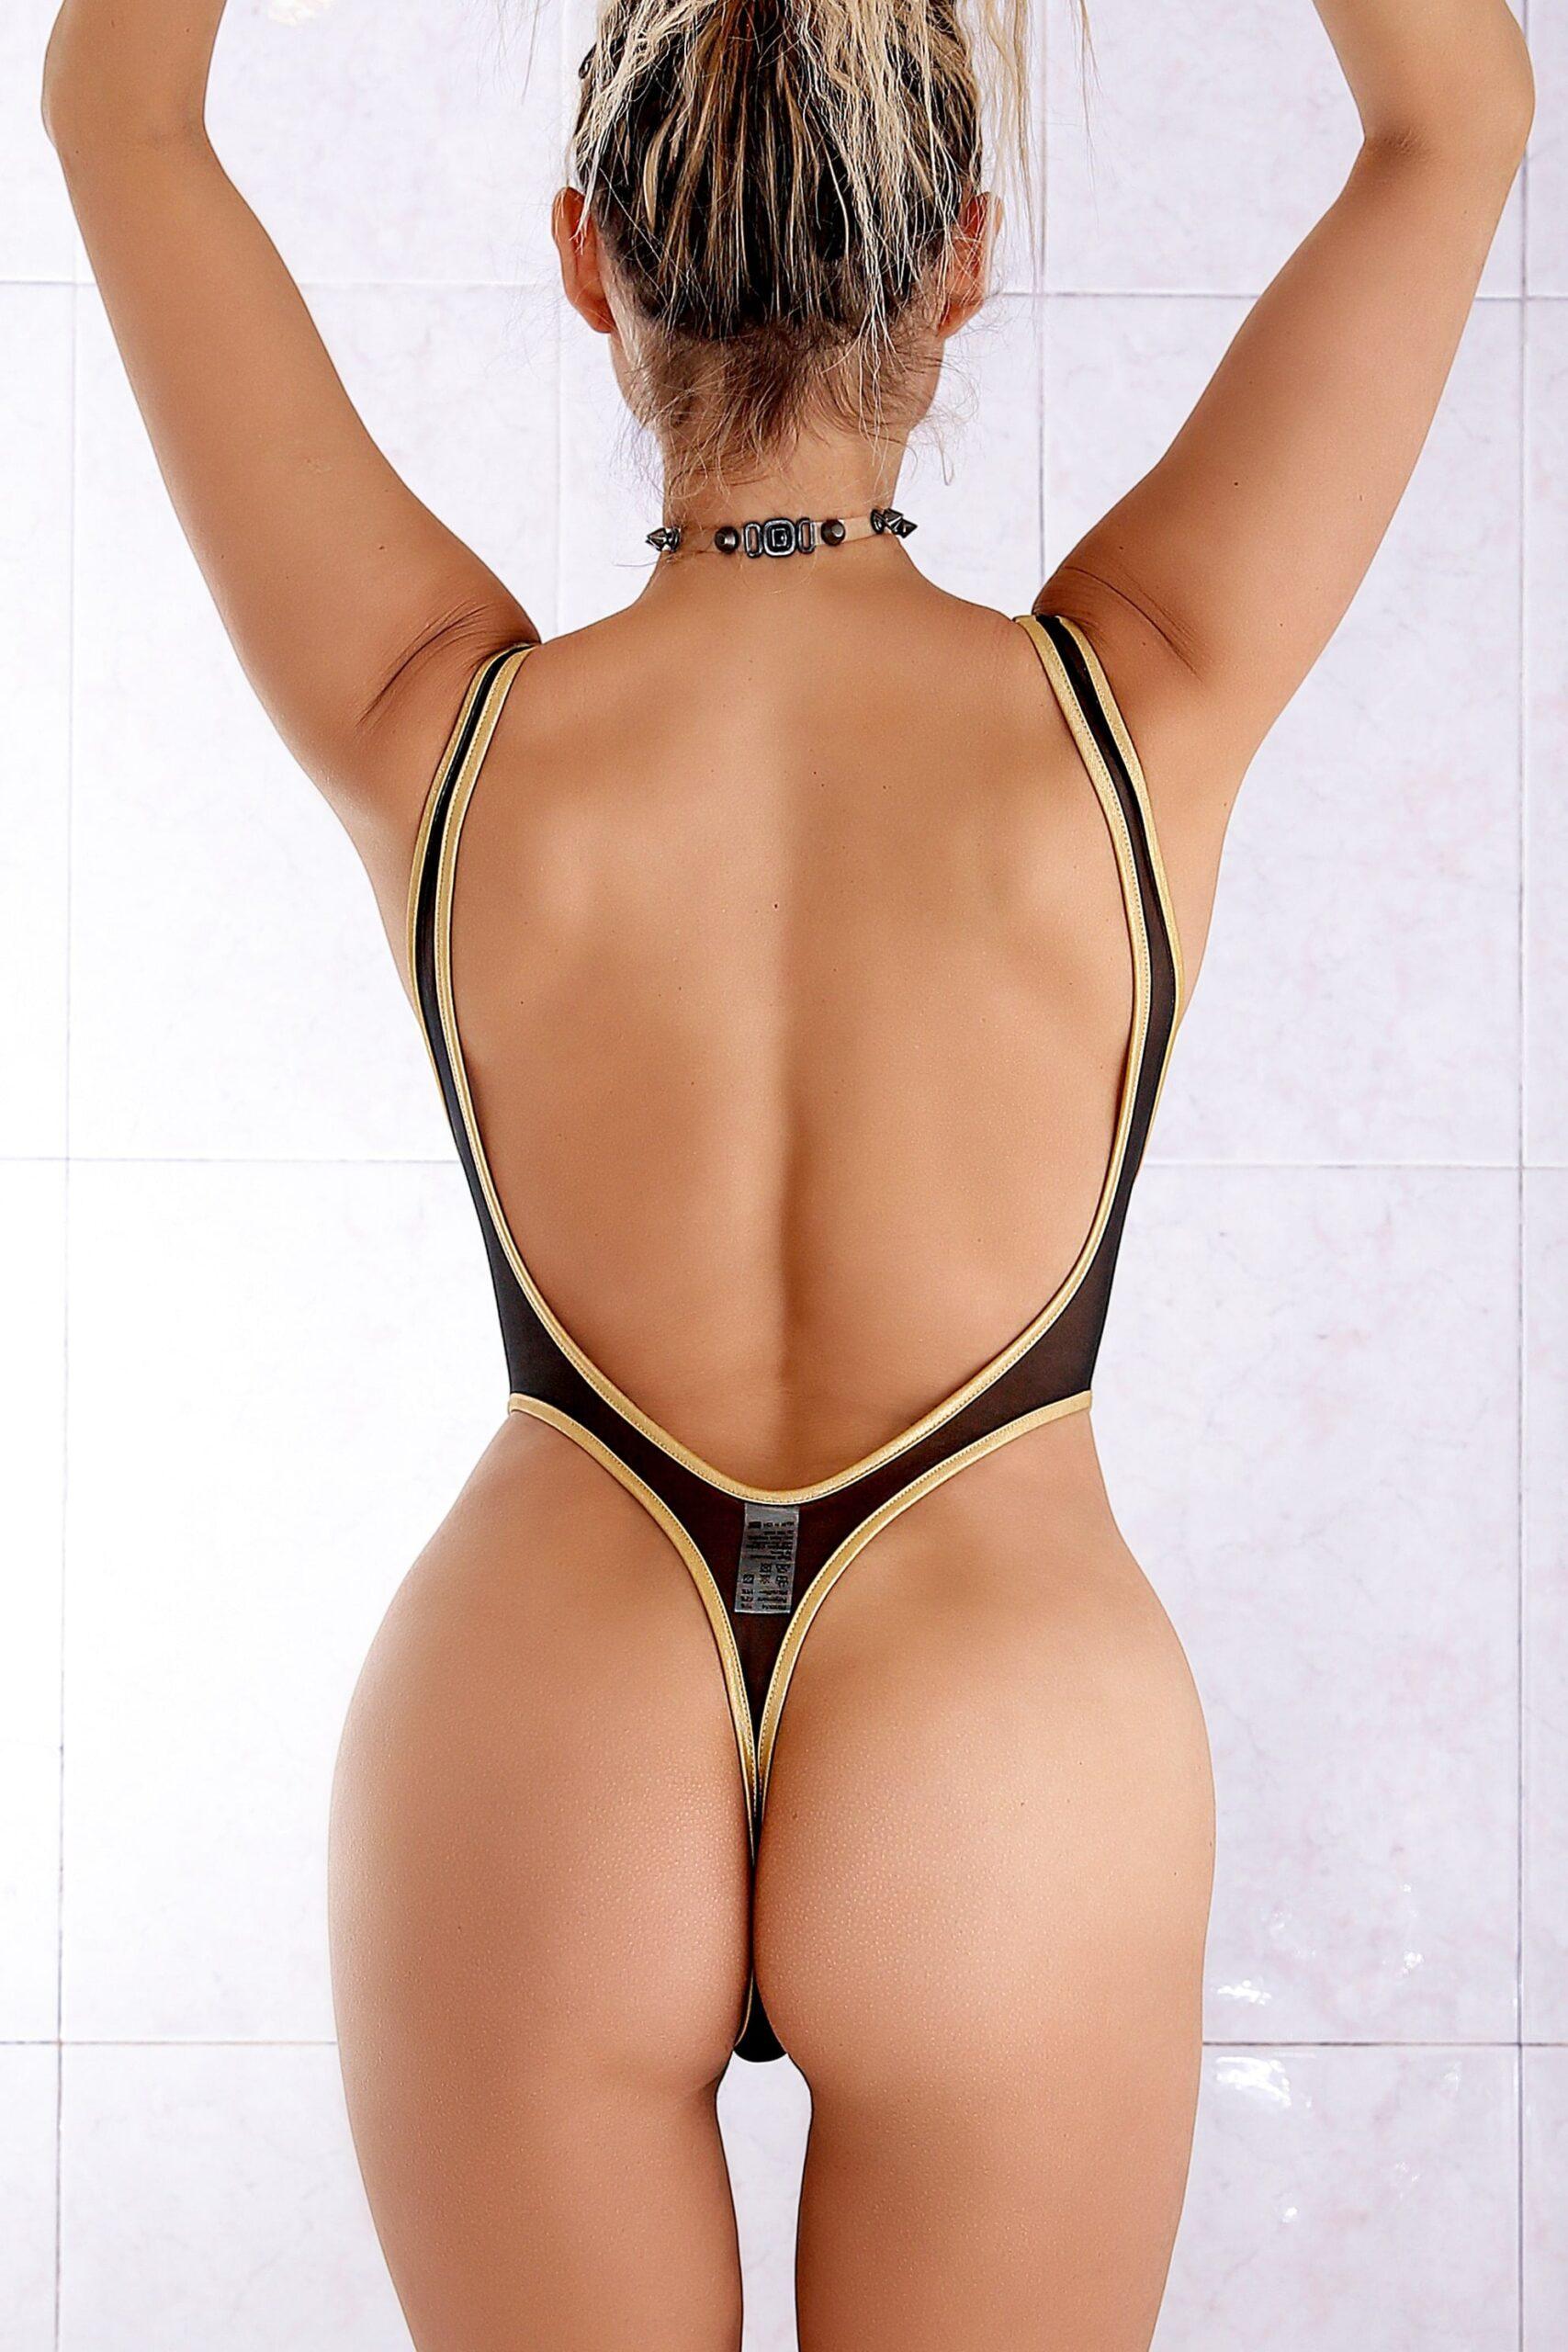 Sheer when wet mesh rave bodysuit thong. Sexy high cut leg one piece swimsuit monokini. See through designer black swimwear.